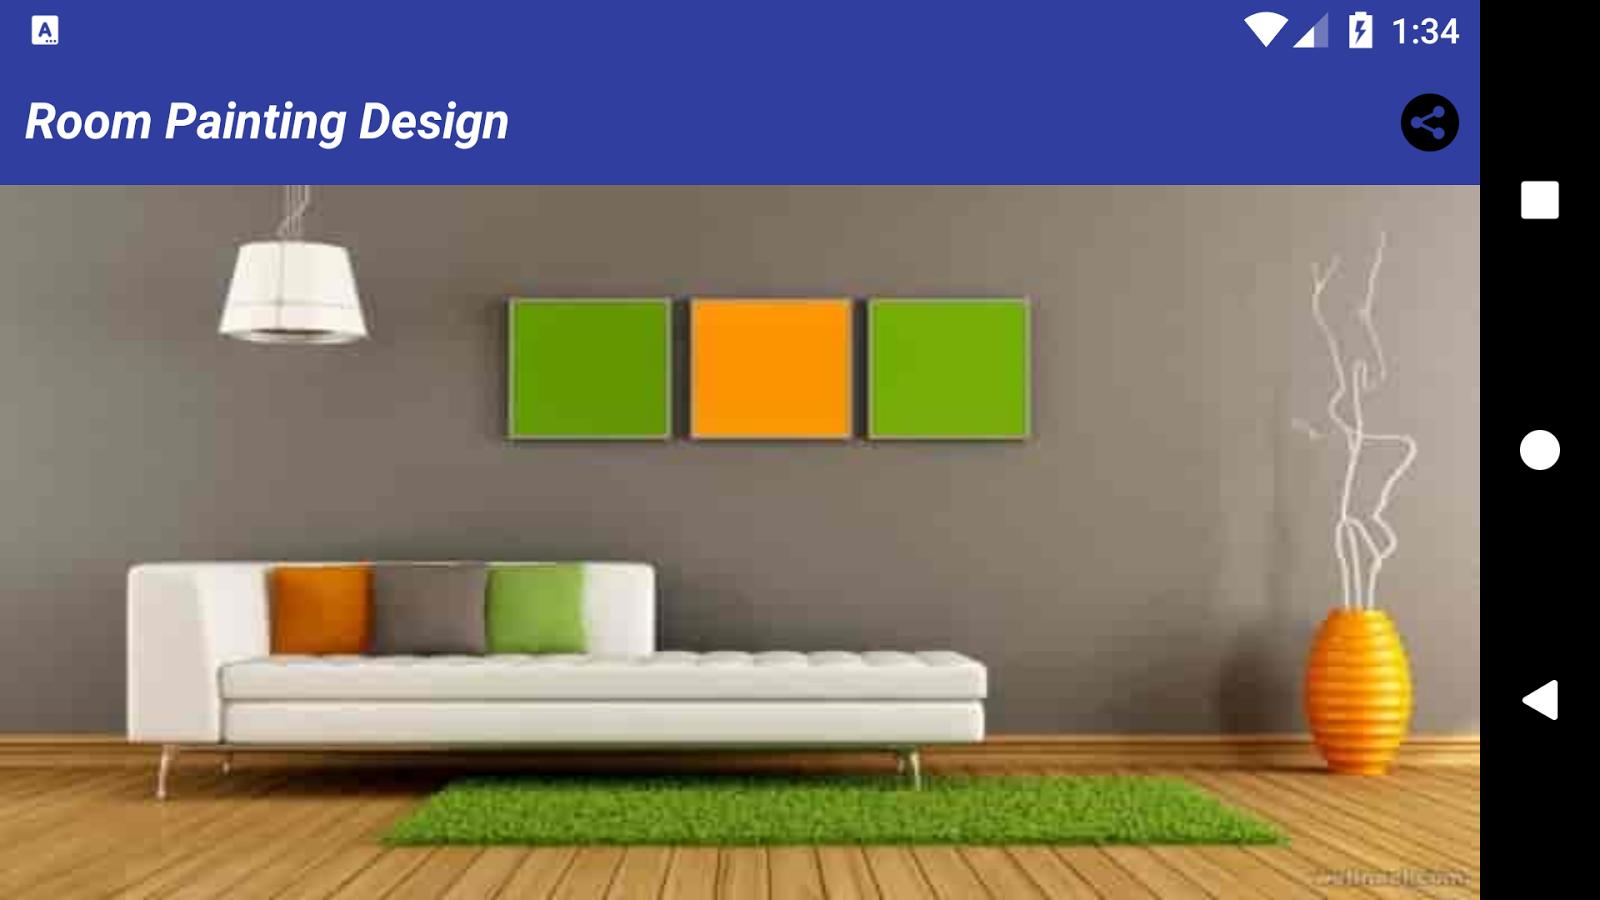 Interior design home painting - Room Painting Ideas Room Design Screenshot